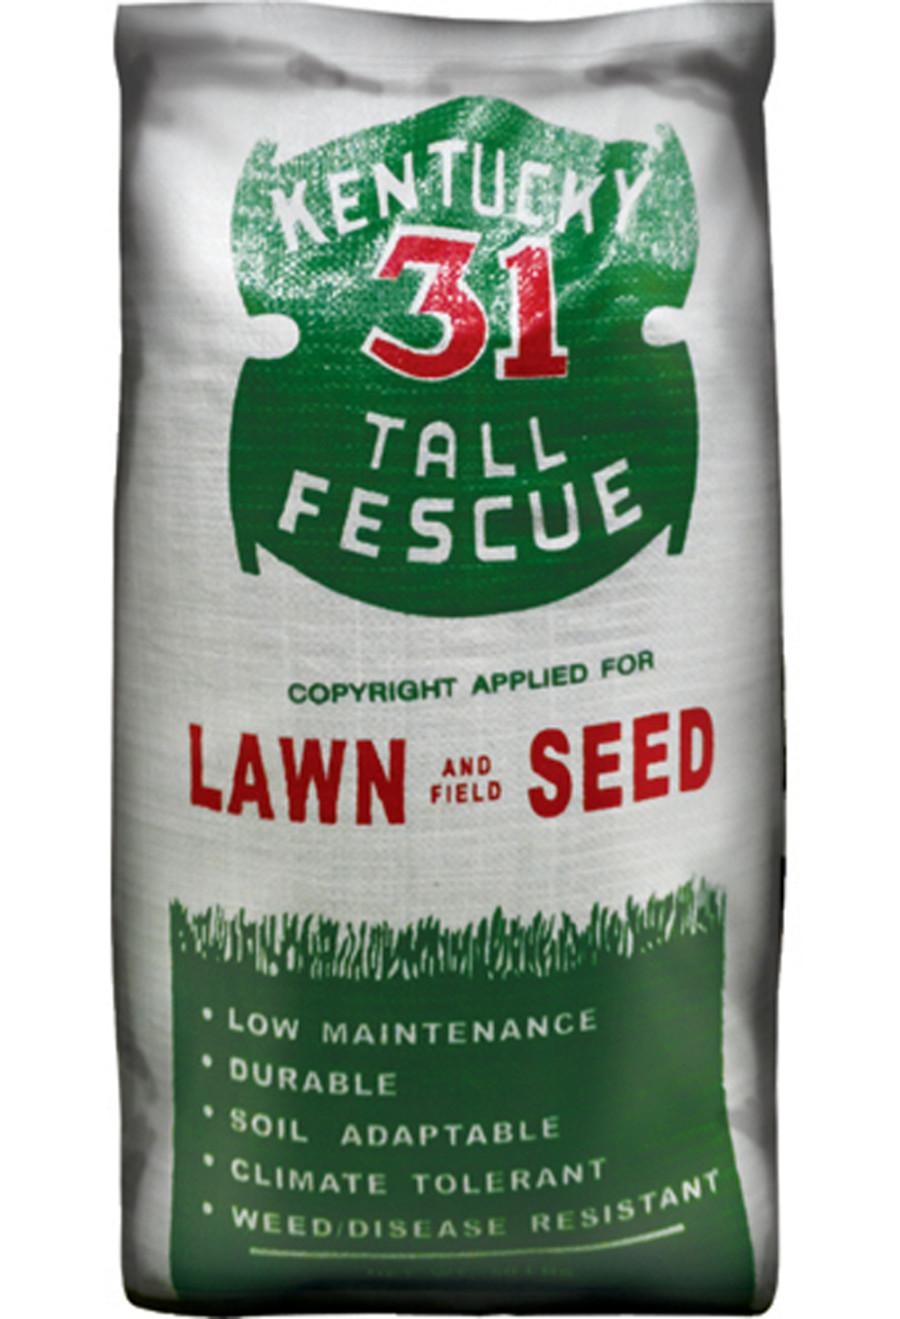 Pennington Kentucky 31 Tall Fescue Lawn and Field Seed 95% Pure 1ea/50 lb